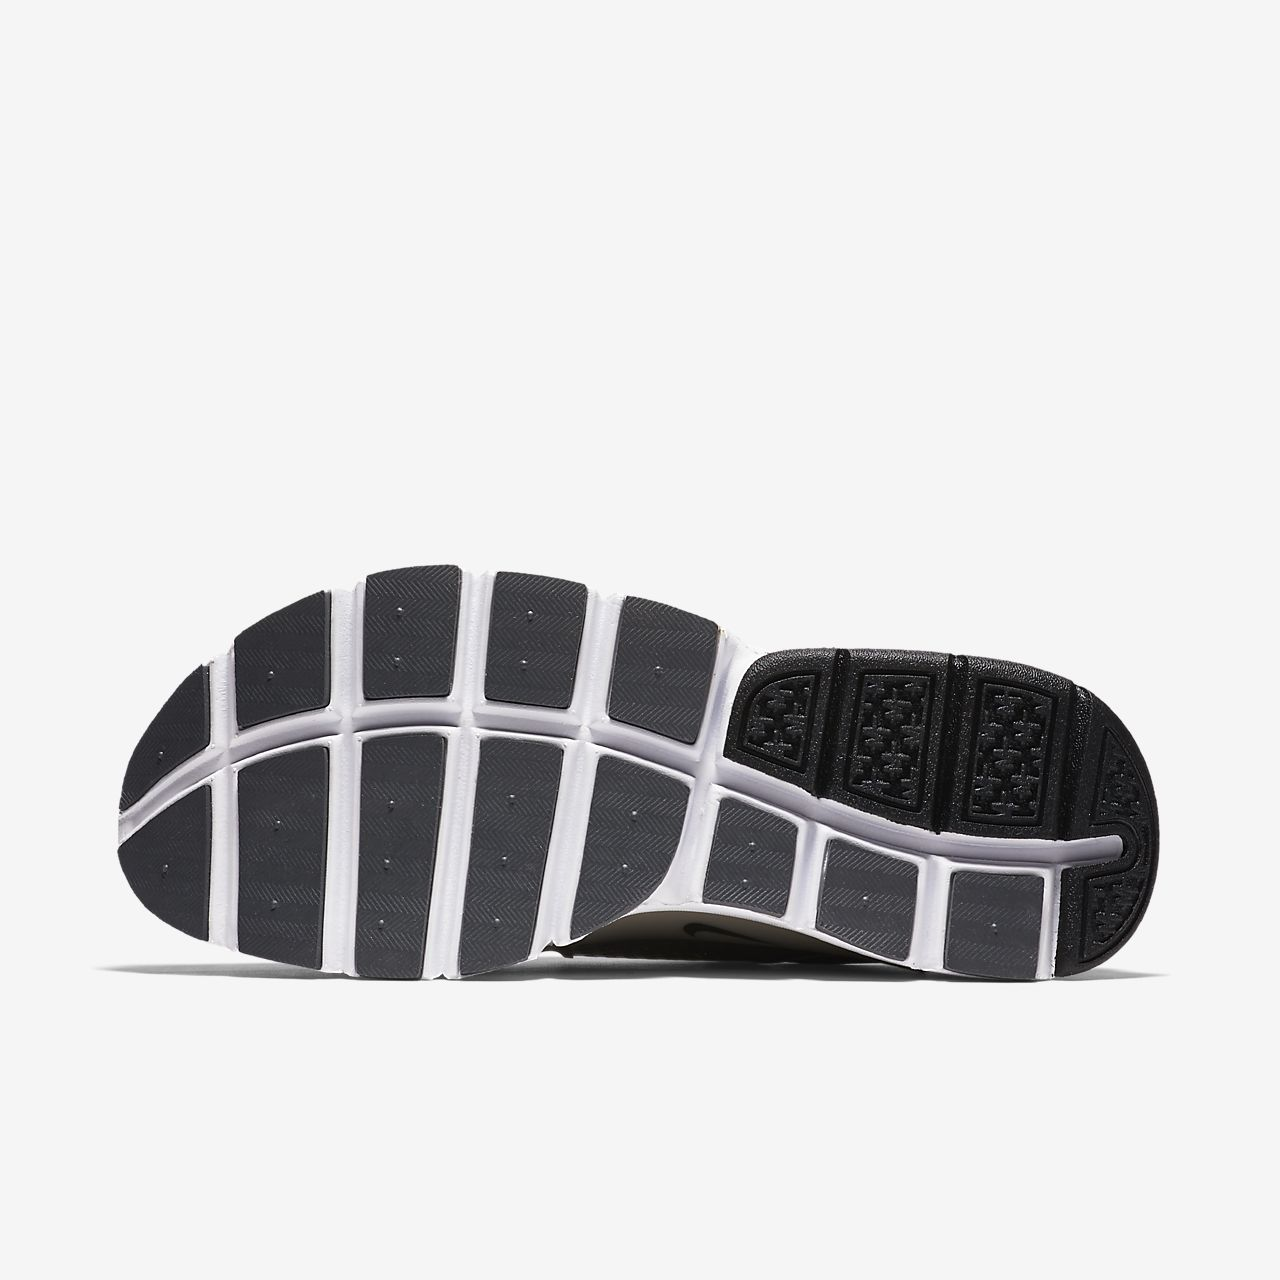 4bebab064821a descuento tenis nike sock dart blanco negro masculino zapatos 62687  nike  sock dart azul and gris